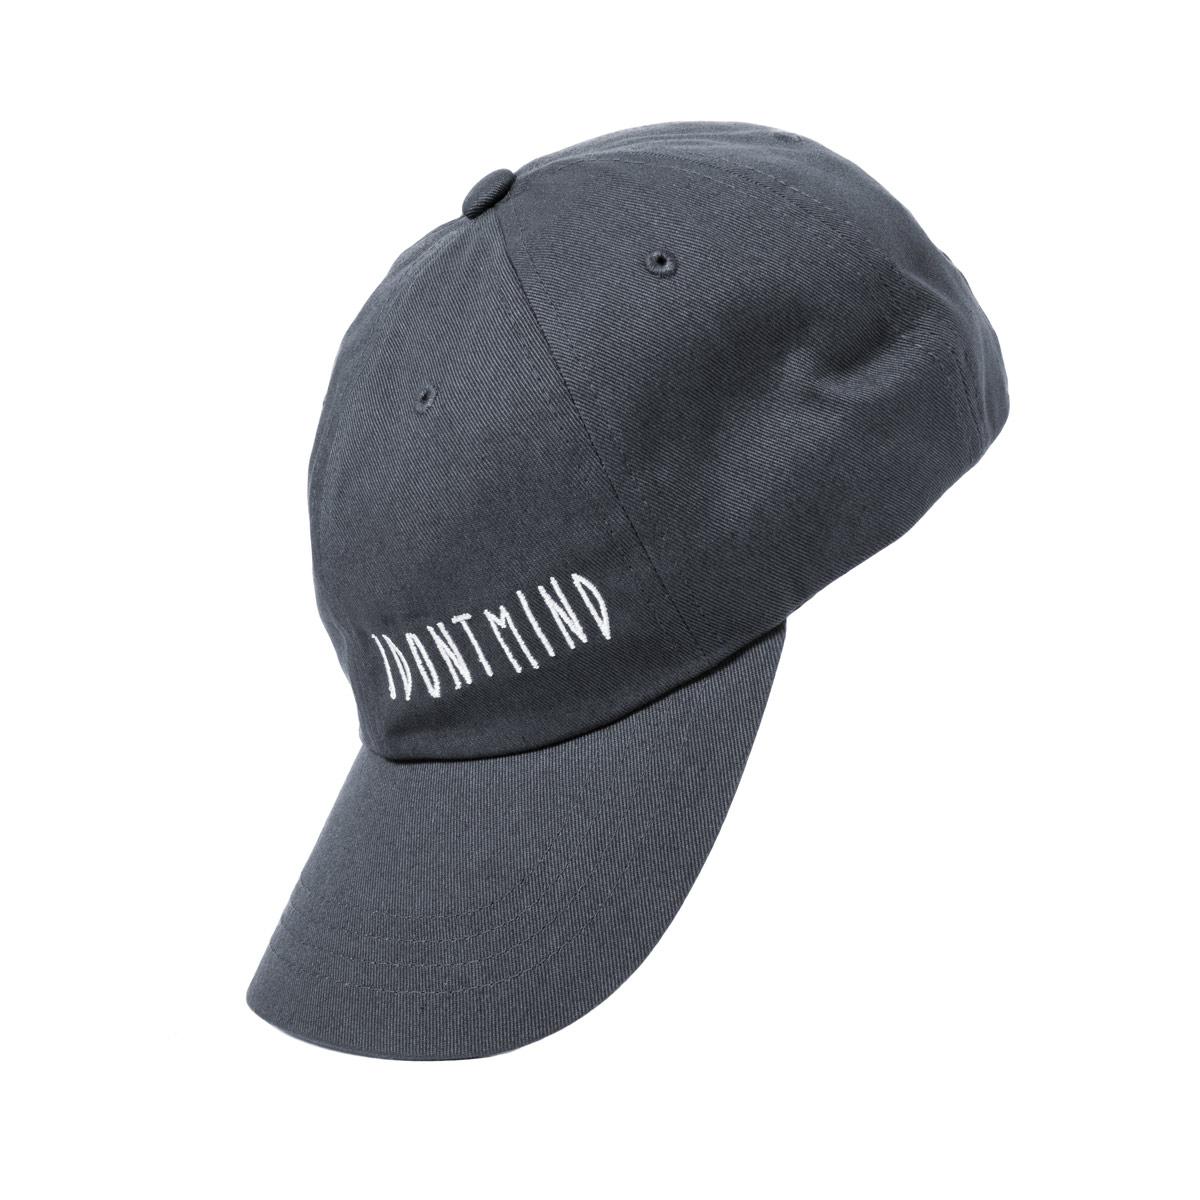 IDONTMIND-Storm-Hat-Angle.jpg